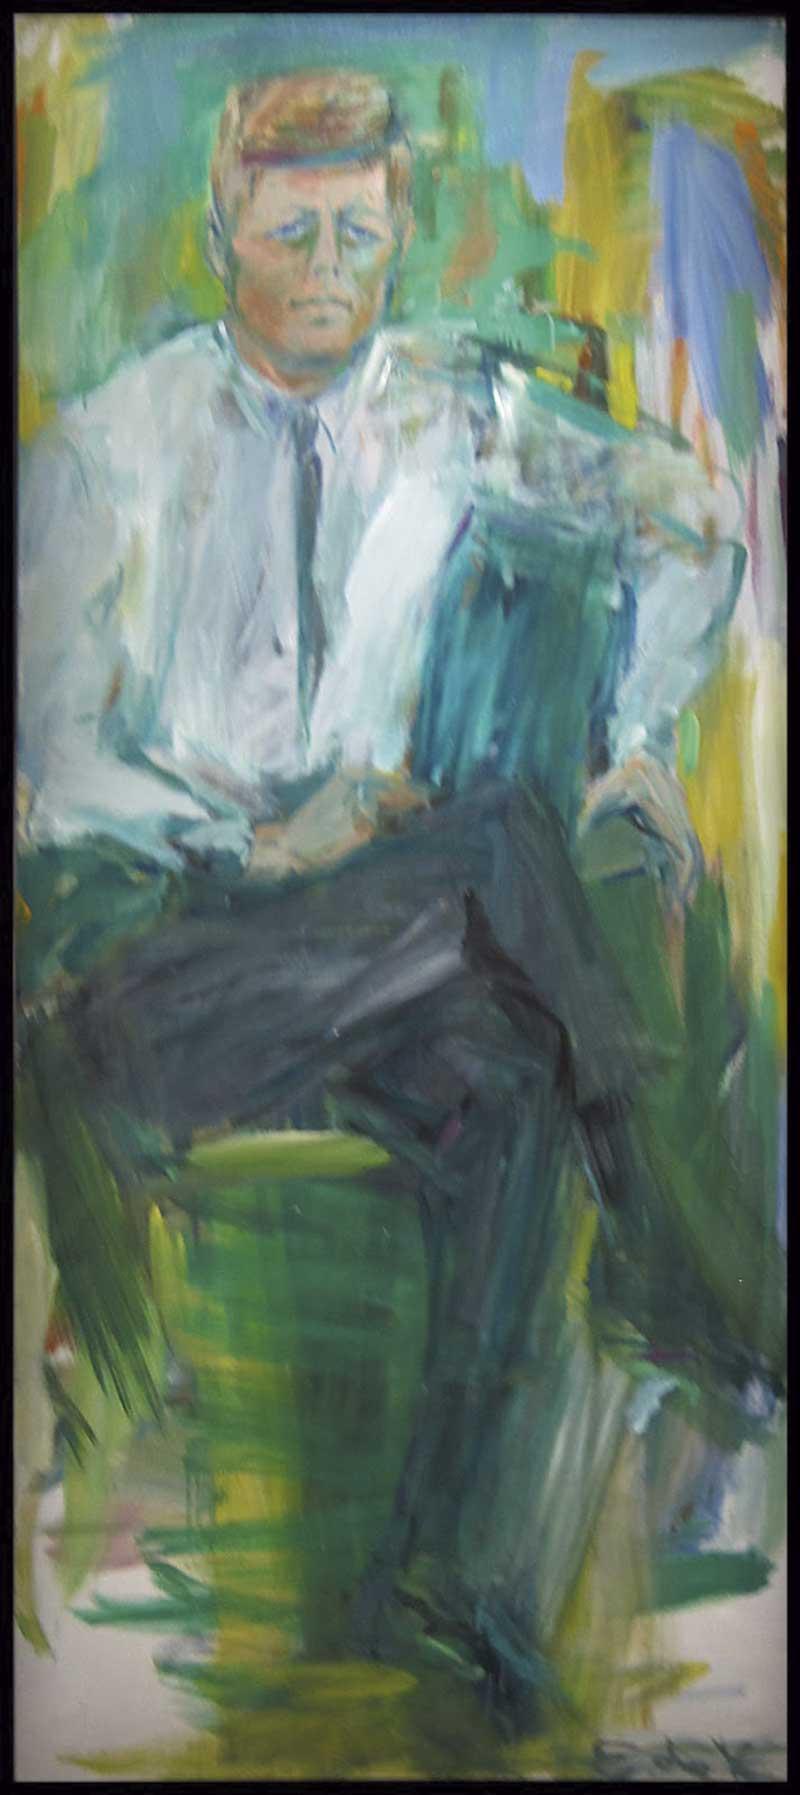 'JFK portrait'. Elaine de Kooning. Arte